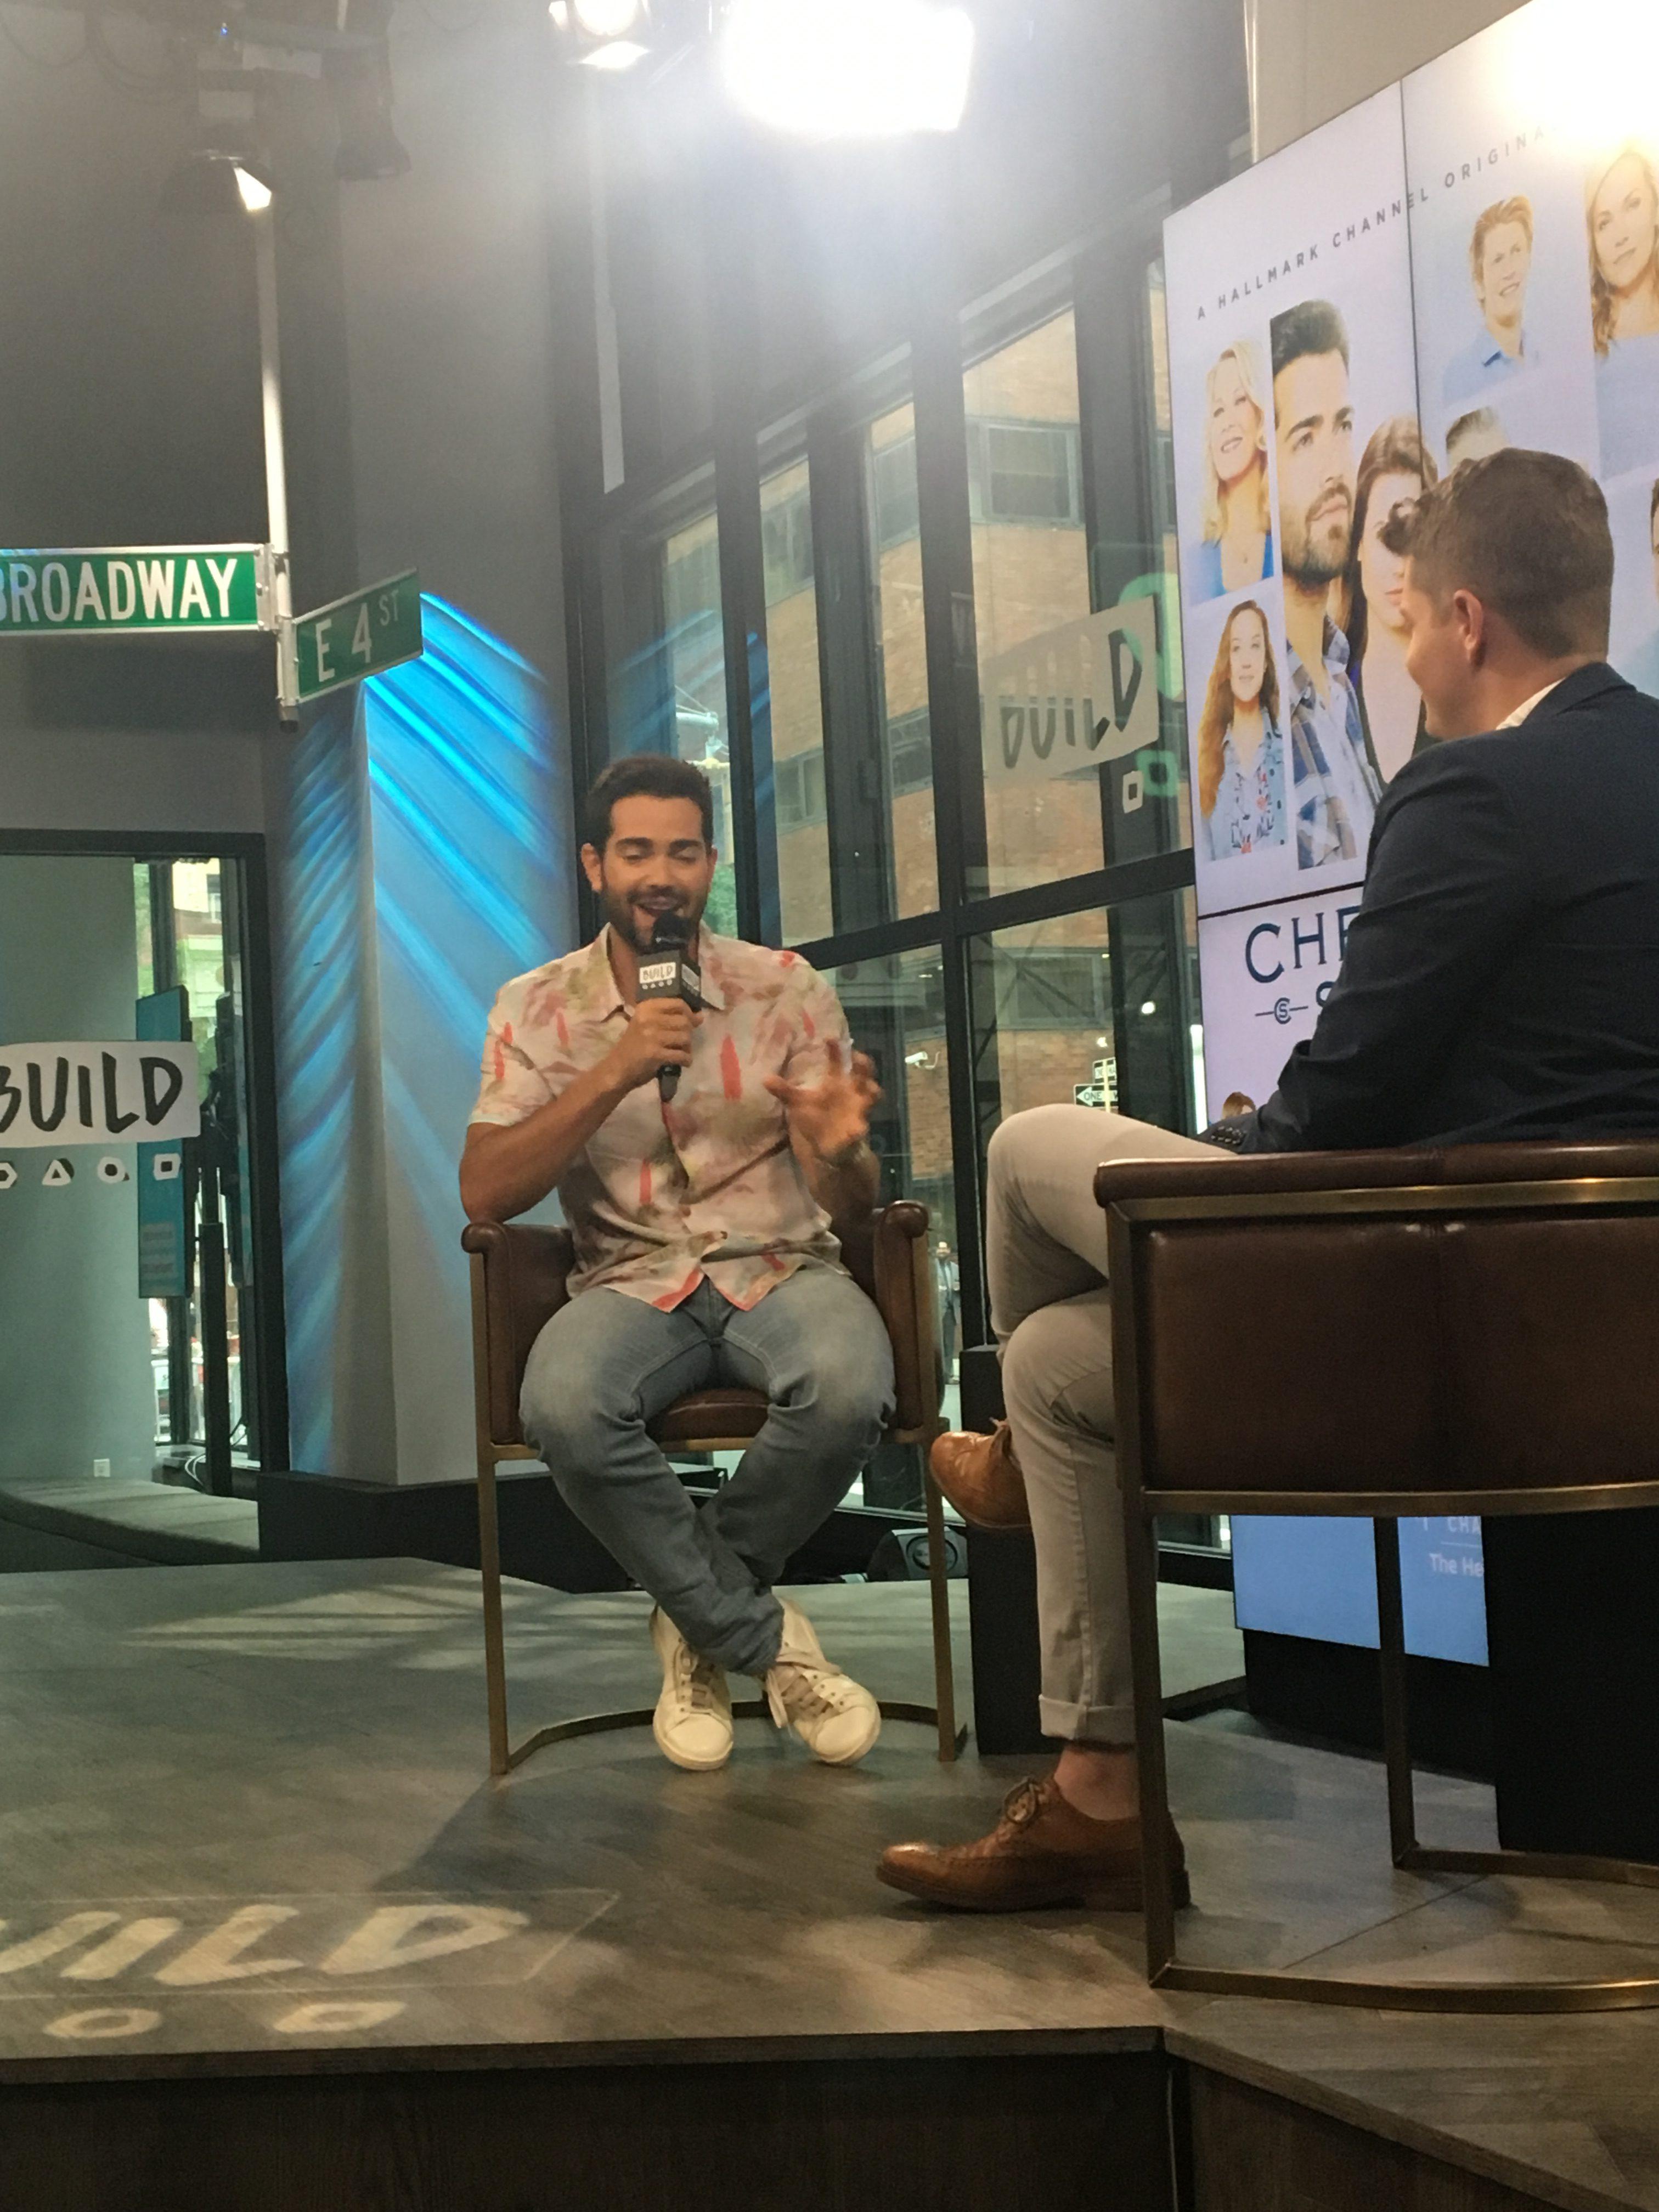 Meeting a Hollywood celebrity crush: Jesse Metcalfe @jessemetcalfe